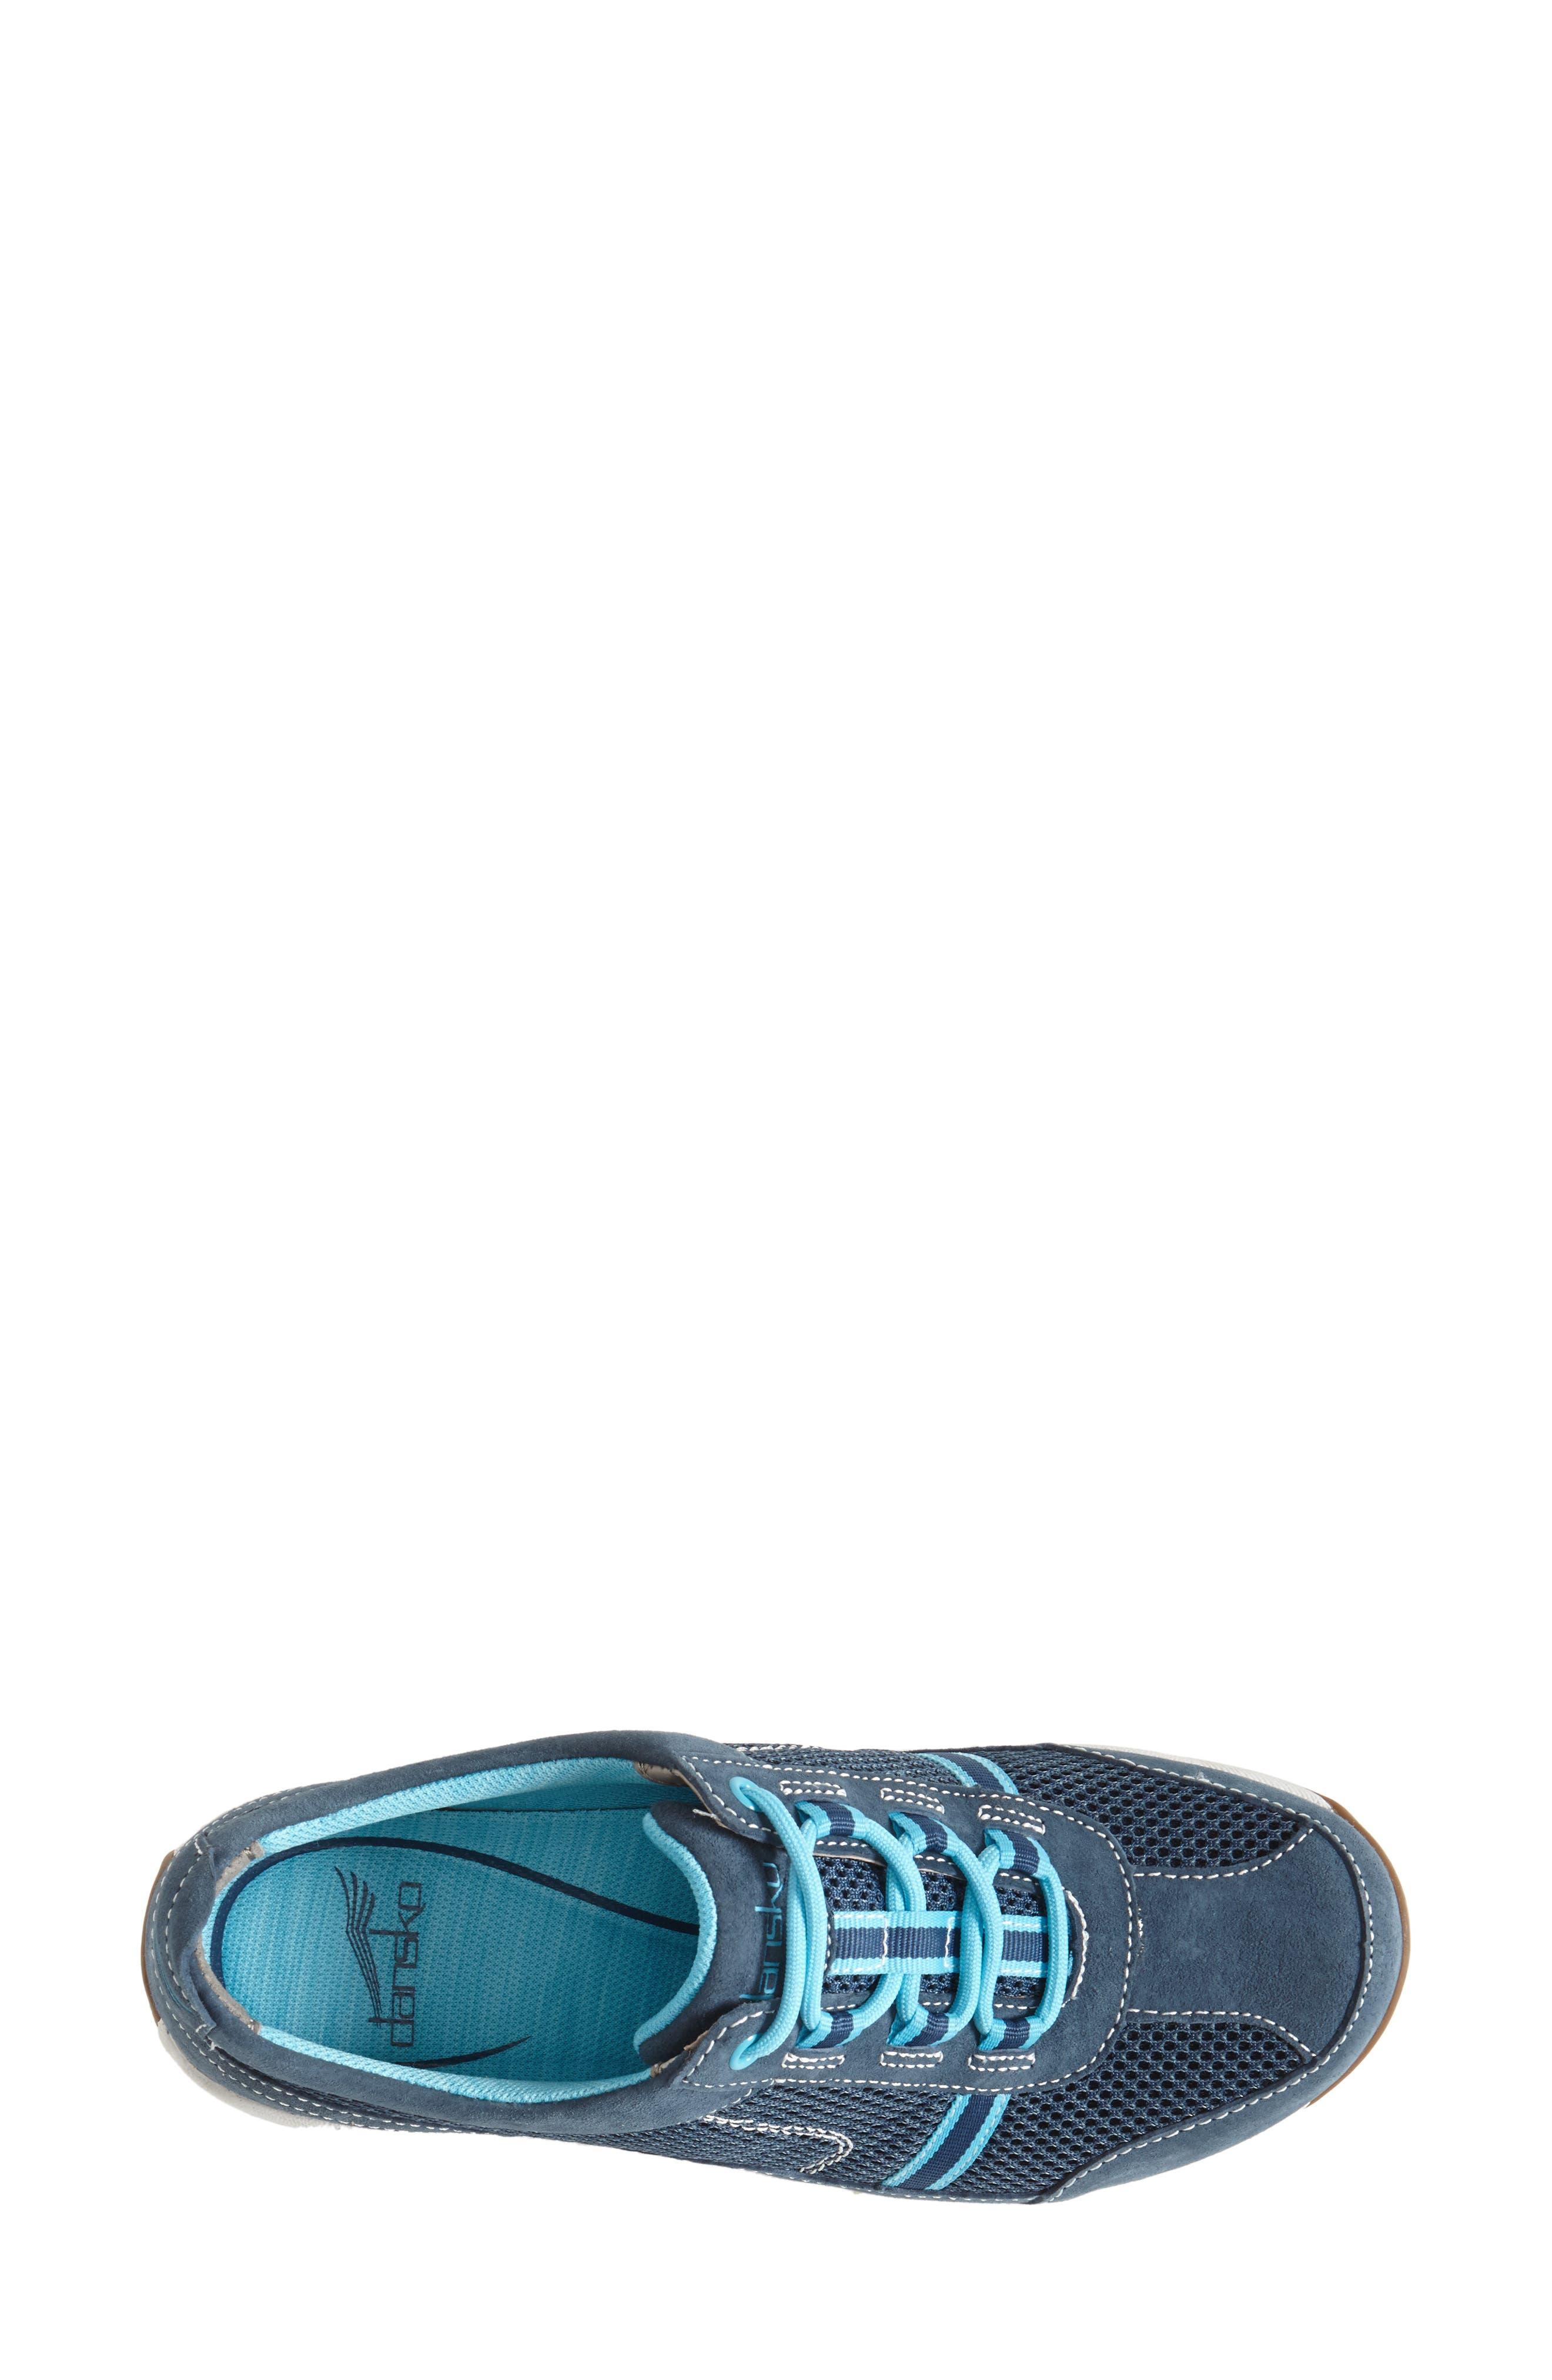 'Helen' Suede & Mesh Sneaker,                             Alternate thumbnail 26, color,